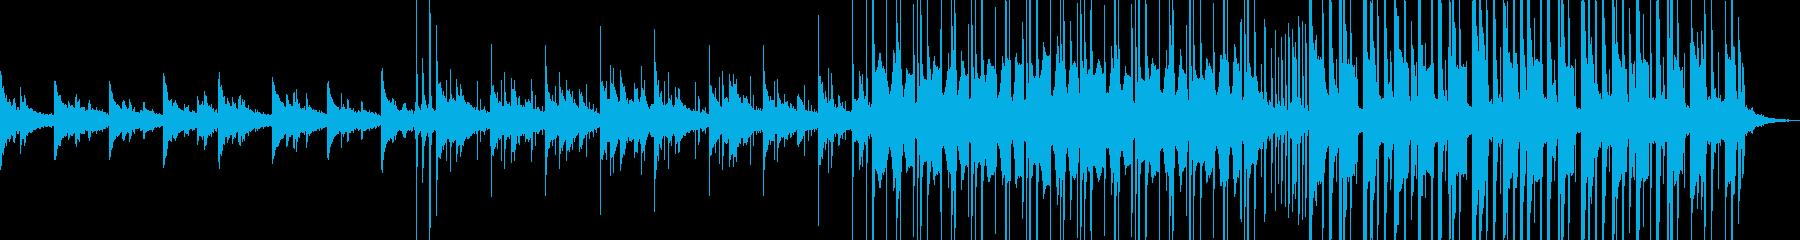 Lofi・イルミネーション・淡い・憂いの再生済みの波形